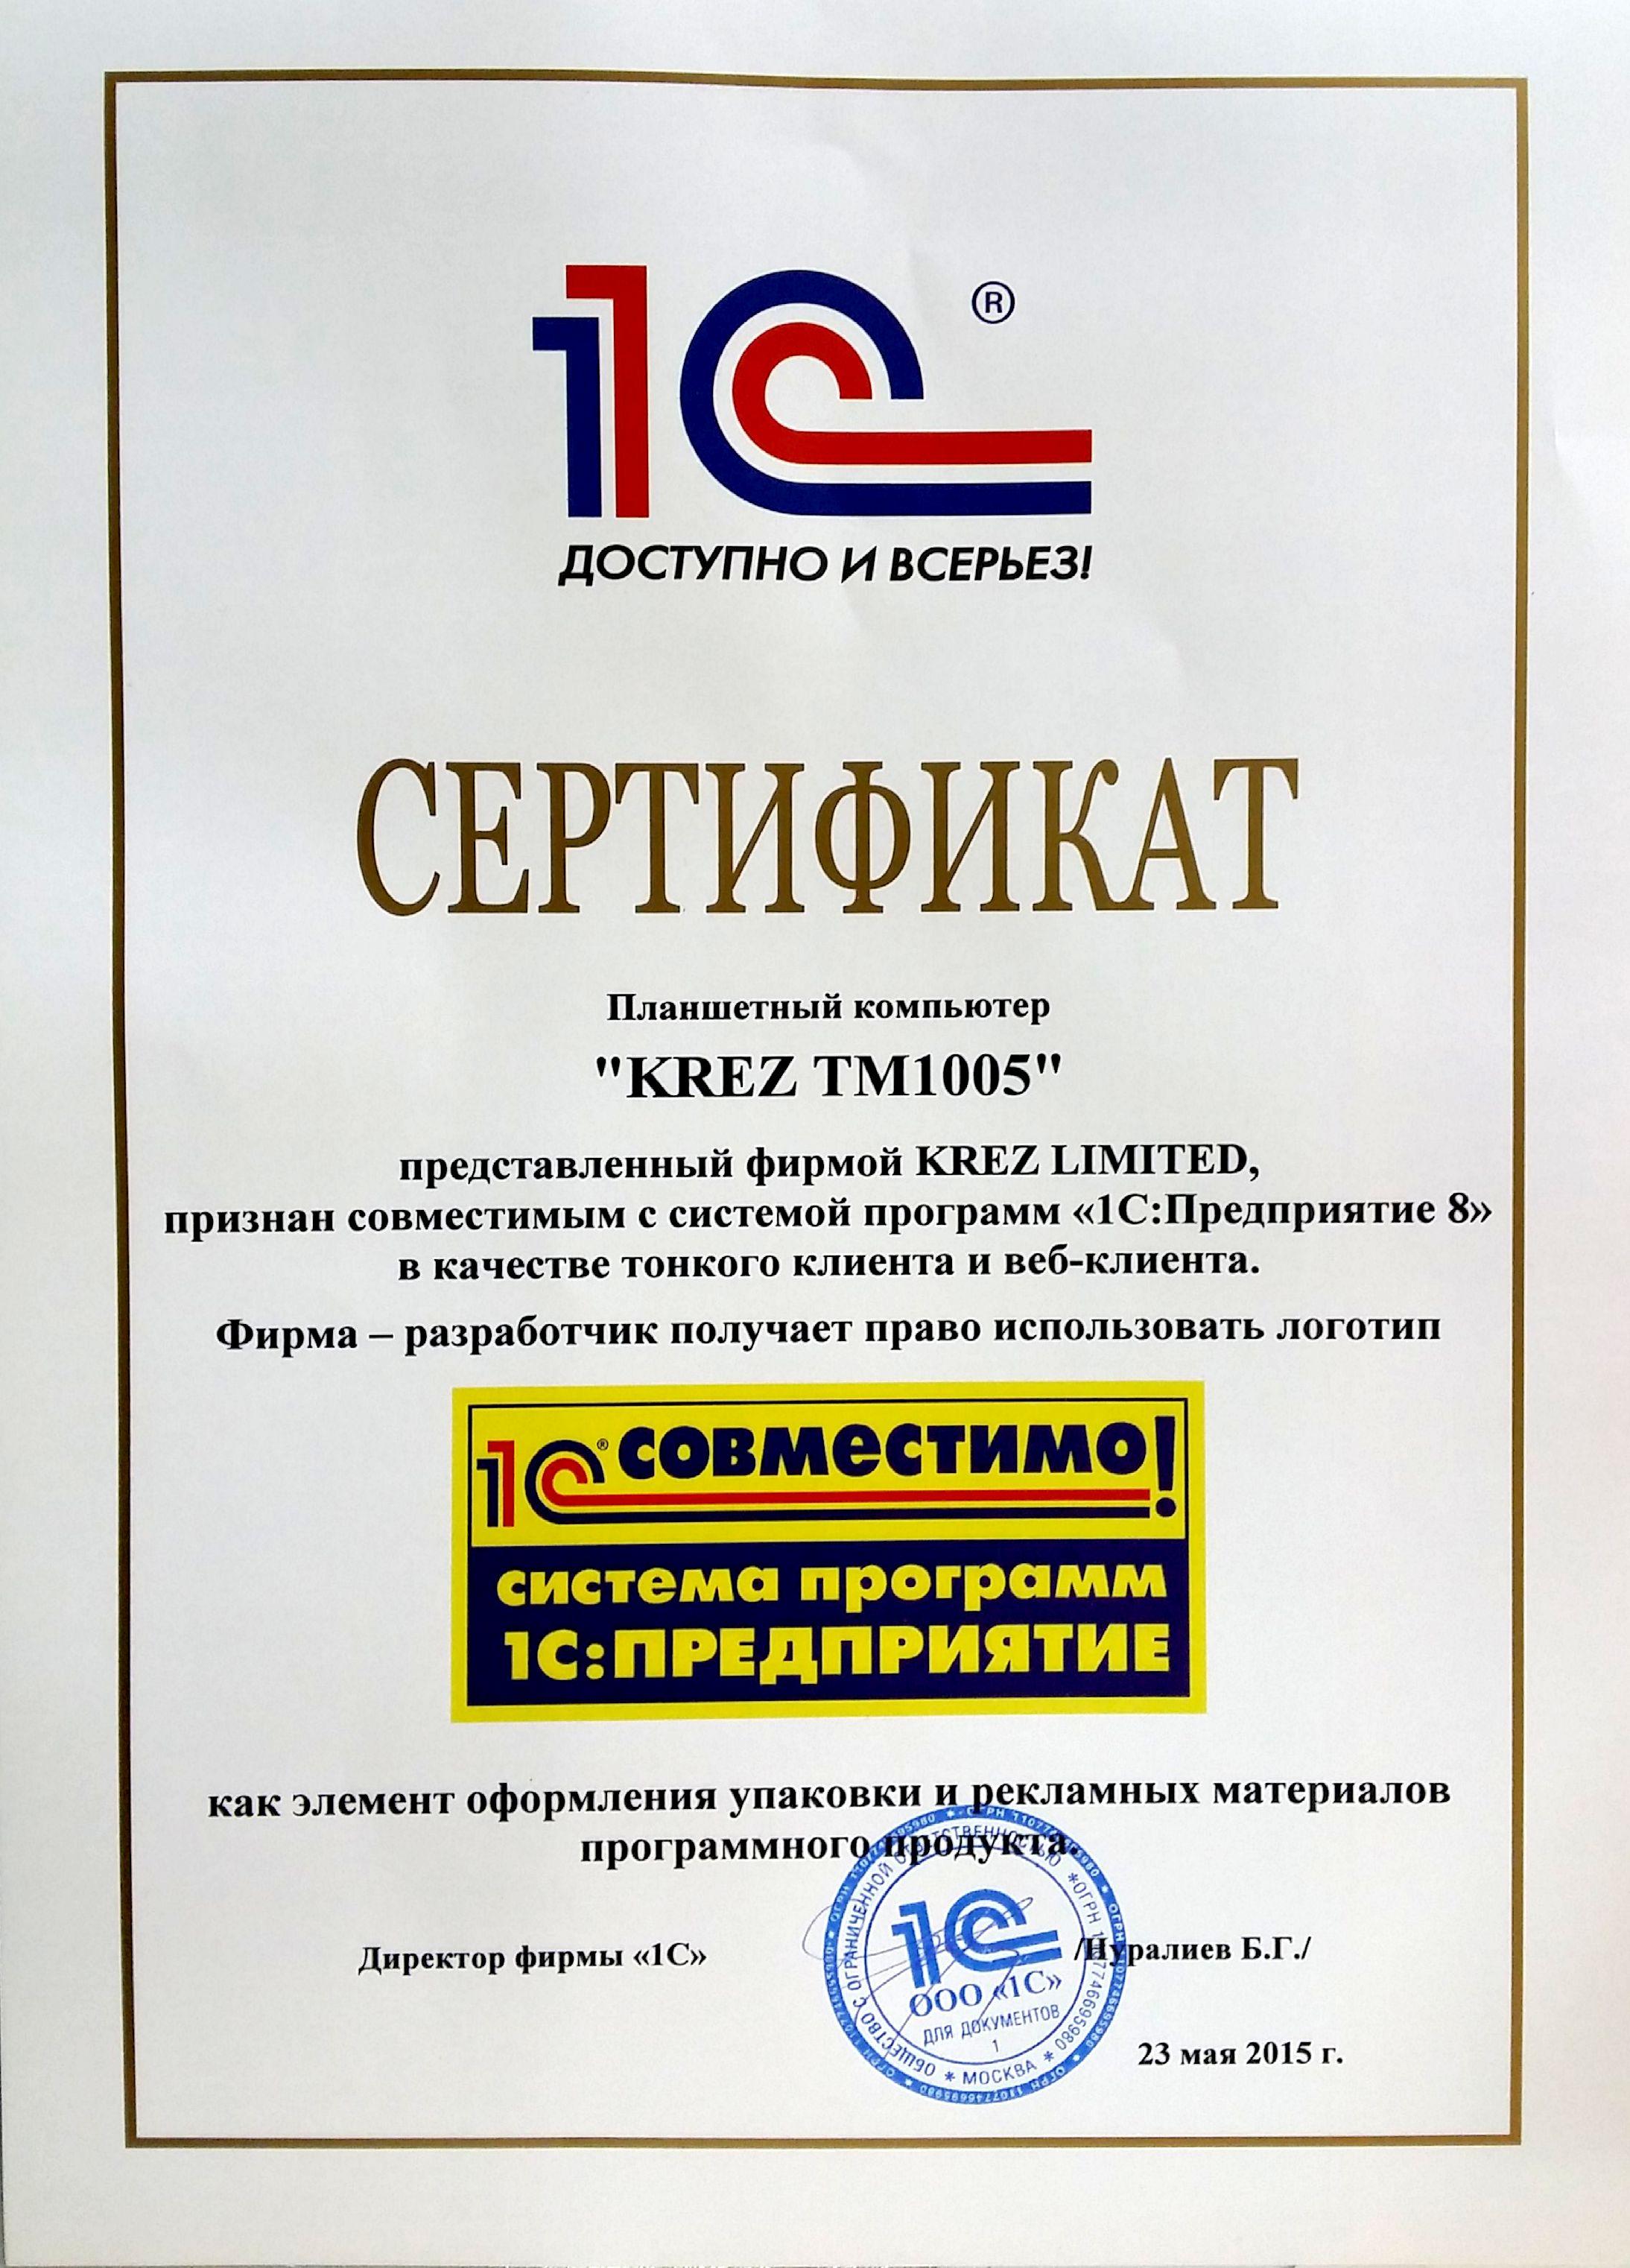 KREZ_TM1005_1C_certificate